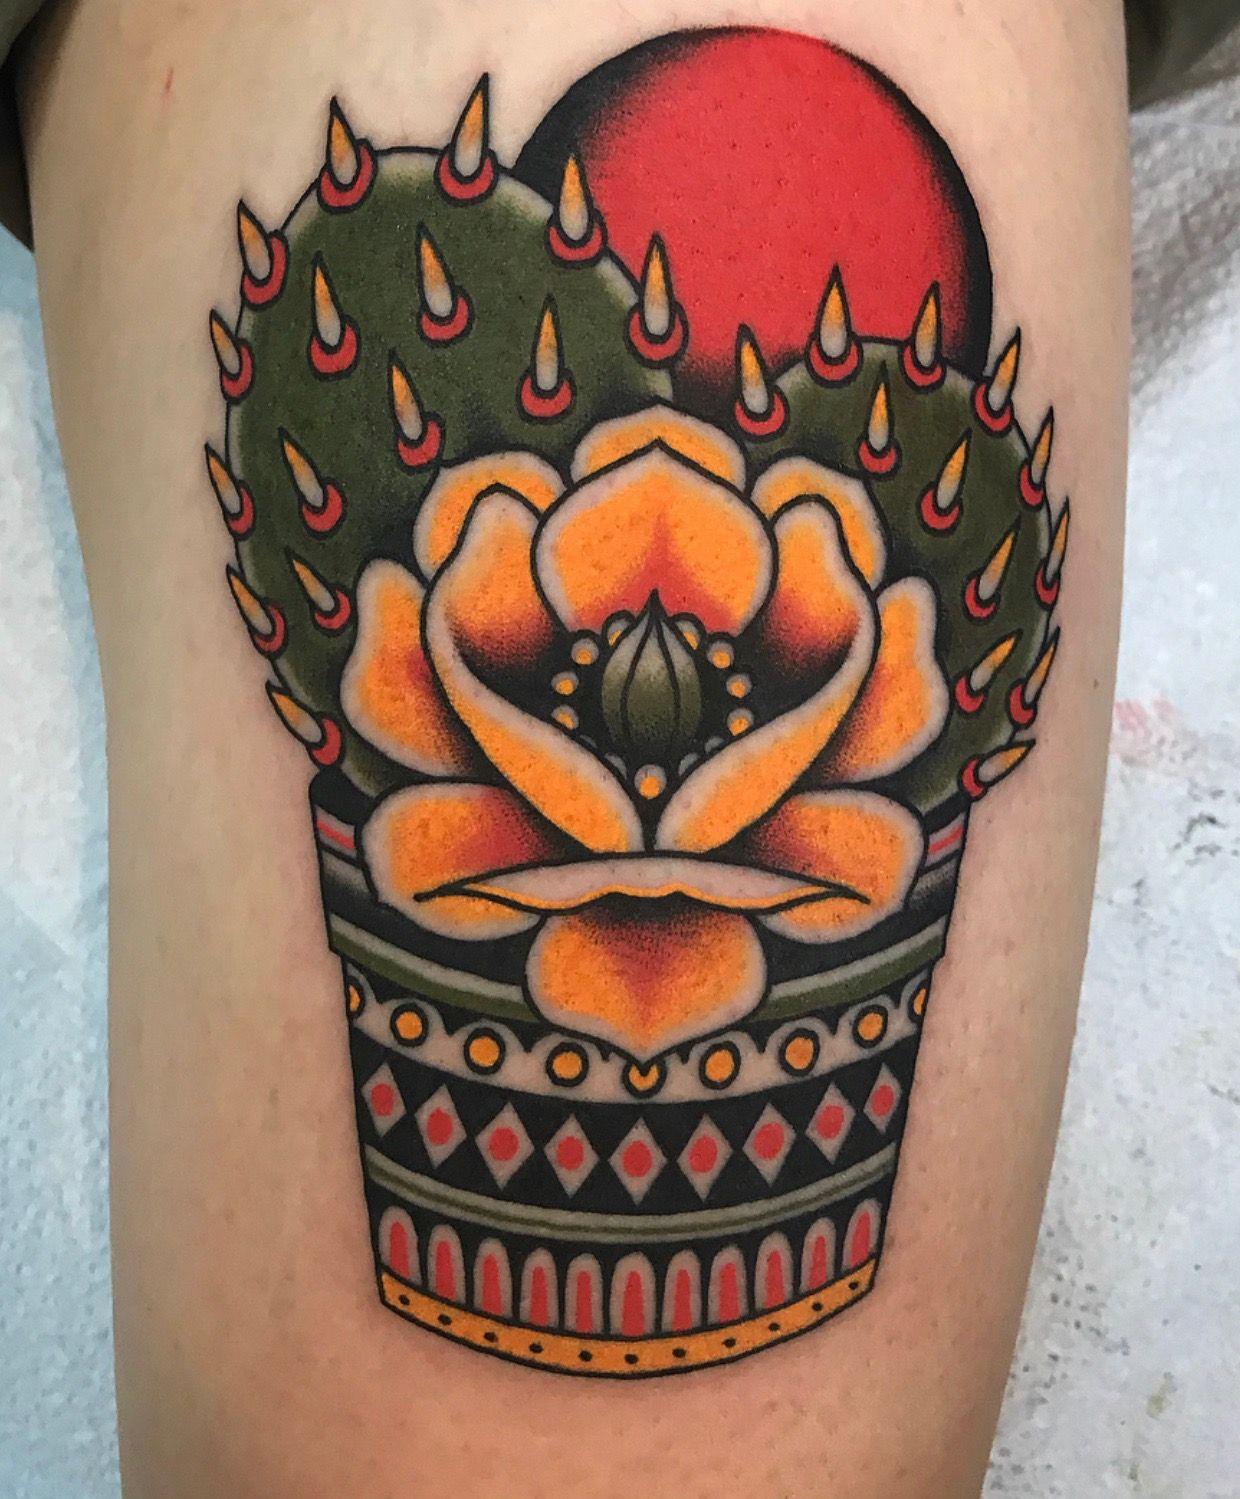 Small Simple Cactus Tattoo Designs (103)